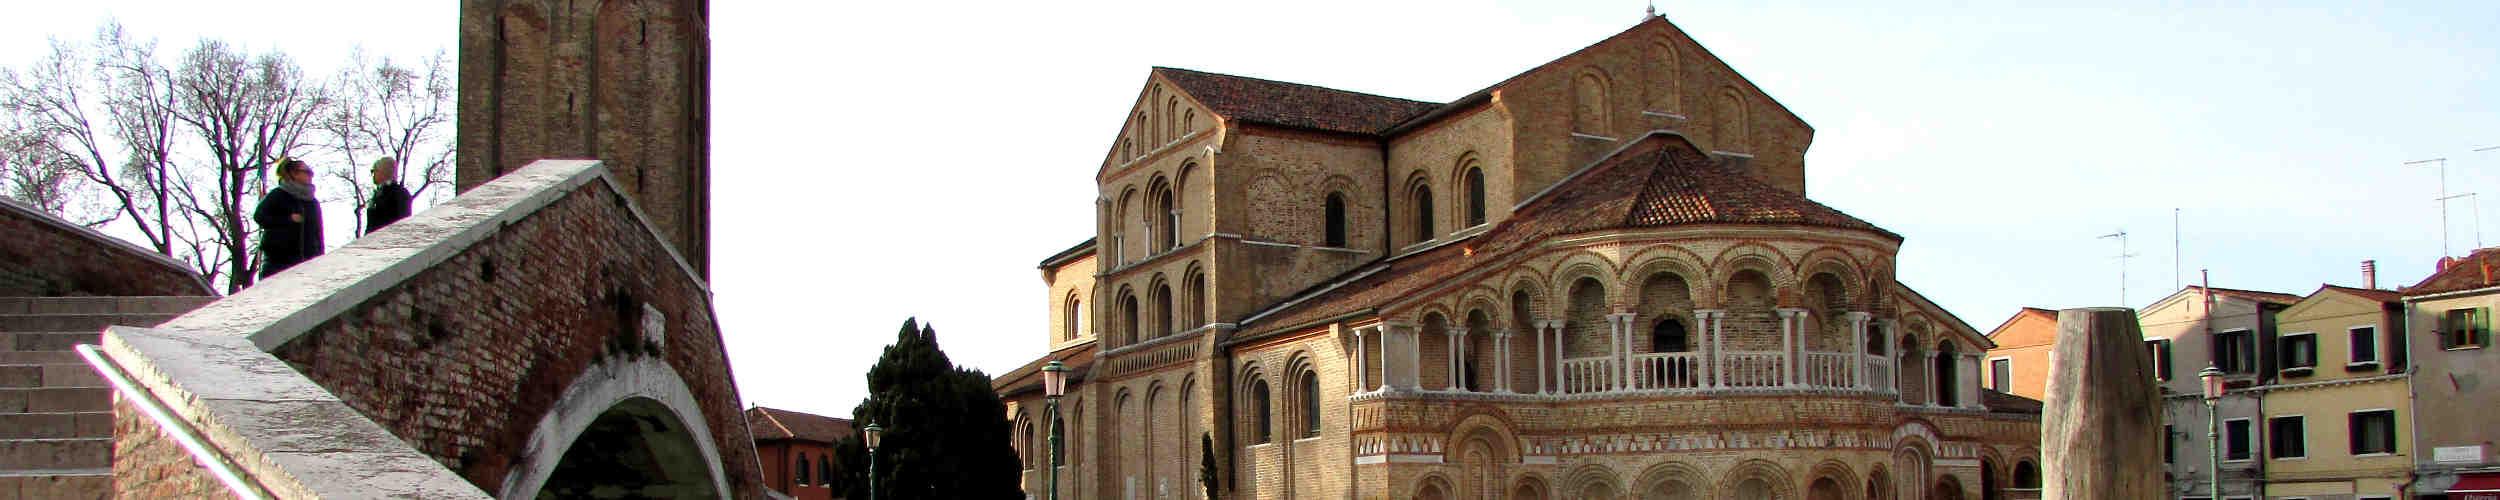 murano san donato church